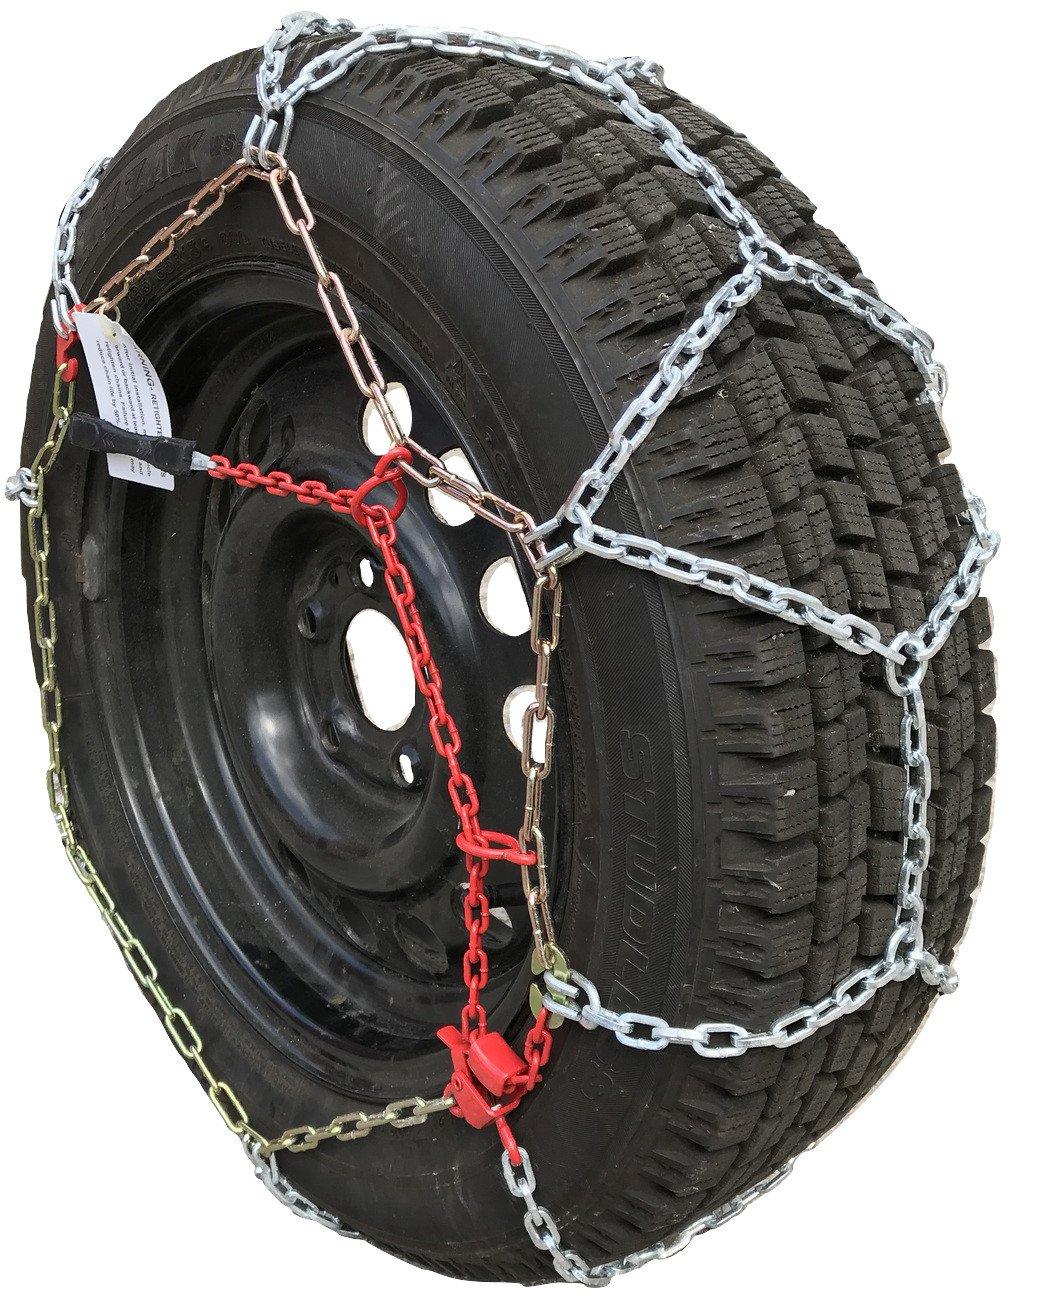 TireChain.com 285/60R18, 285/60 18 ONORM Diamond Tire Chains Set of 2